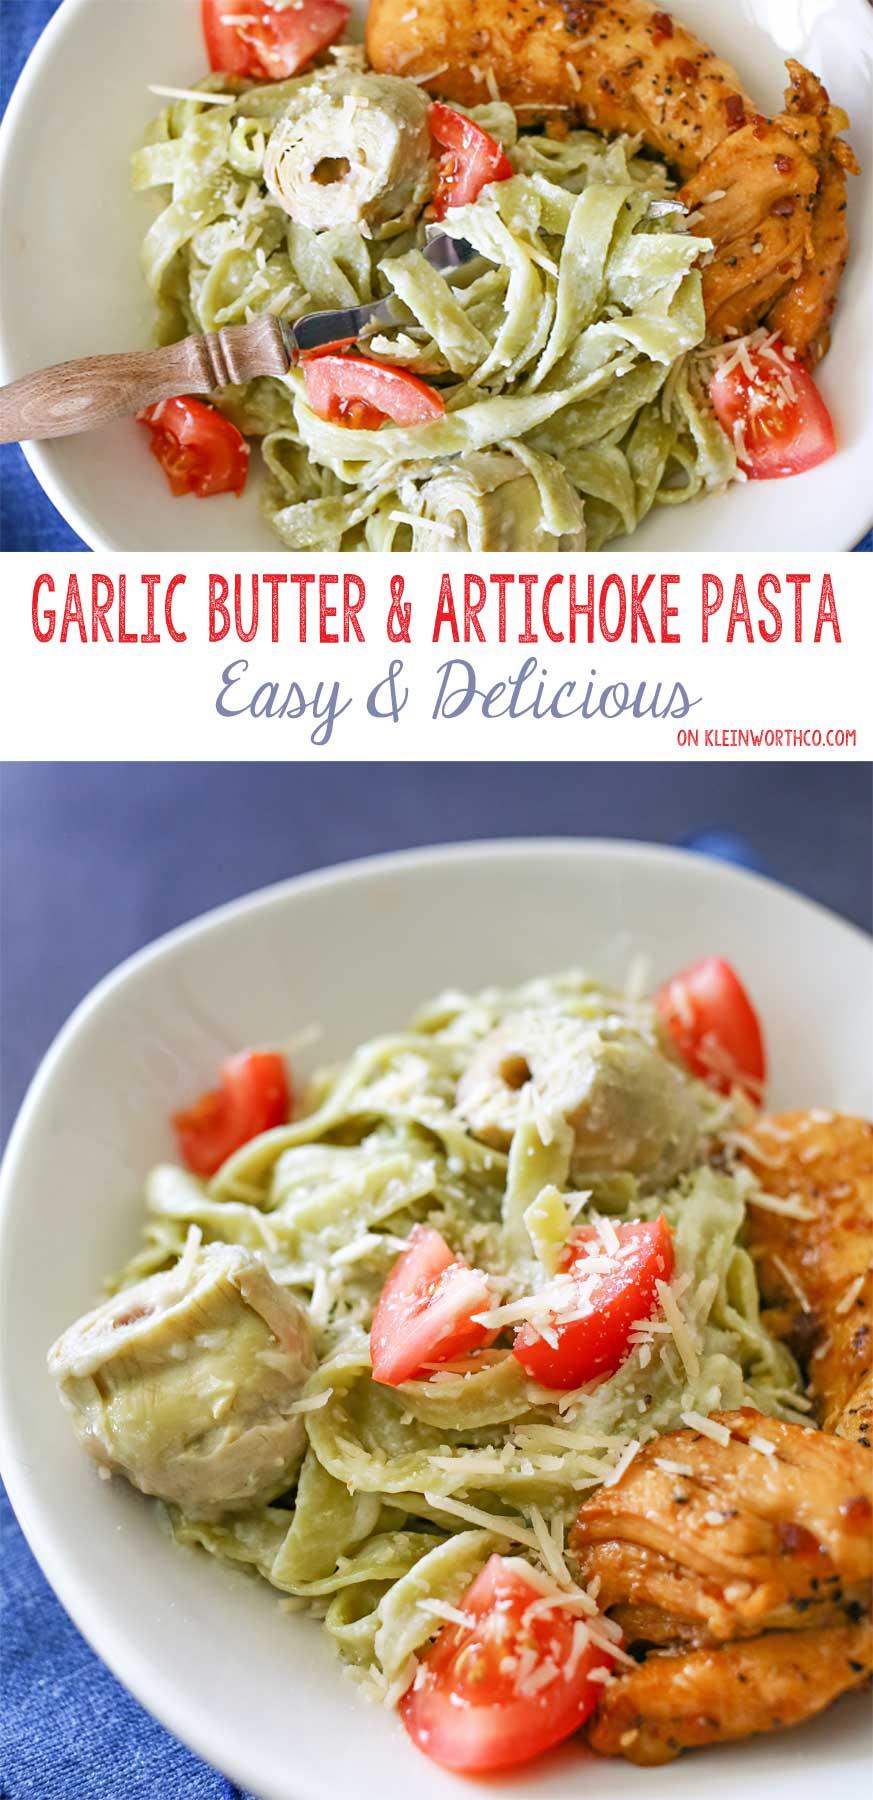 Garlic Butter & Artichoke Pasta